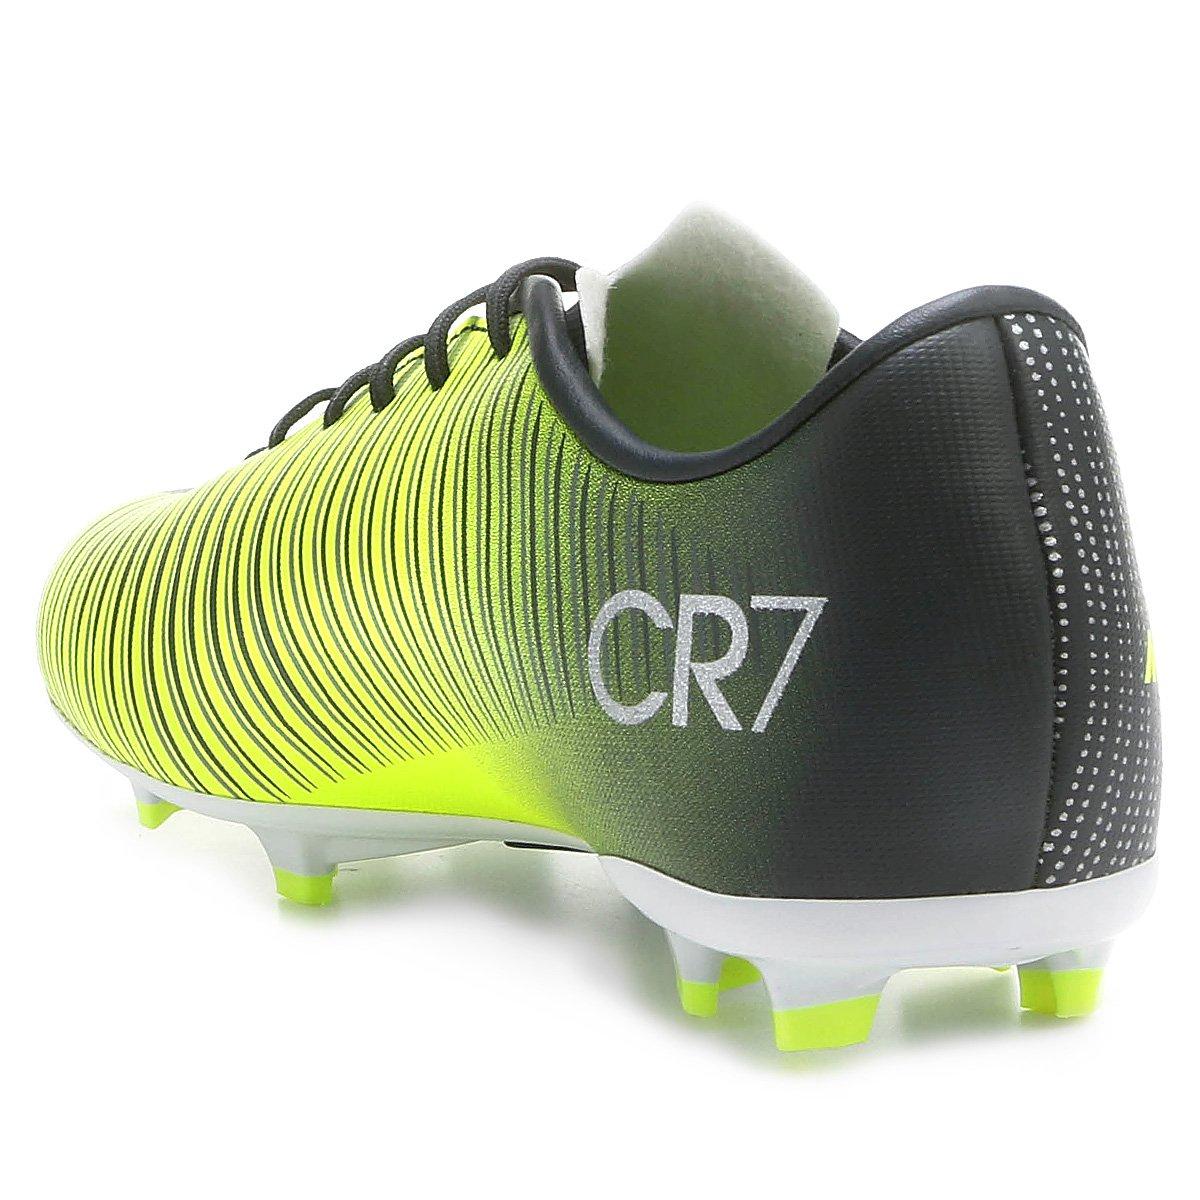 Chuteira Nike Mercurial Victory 6 CR7 FG Campo Infantil - Compre ... 2bba772d1d444